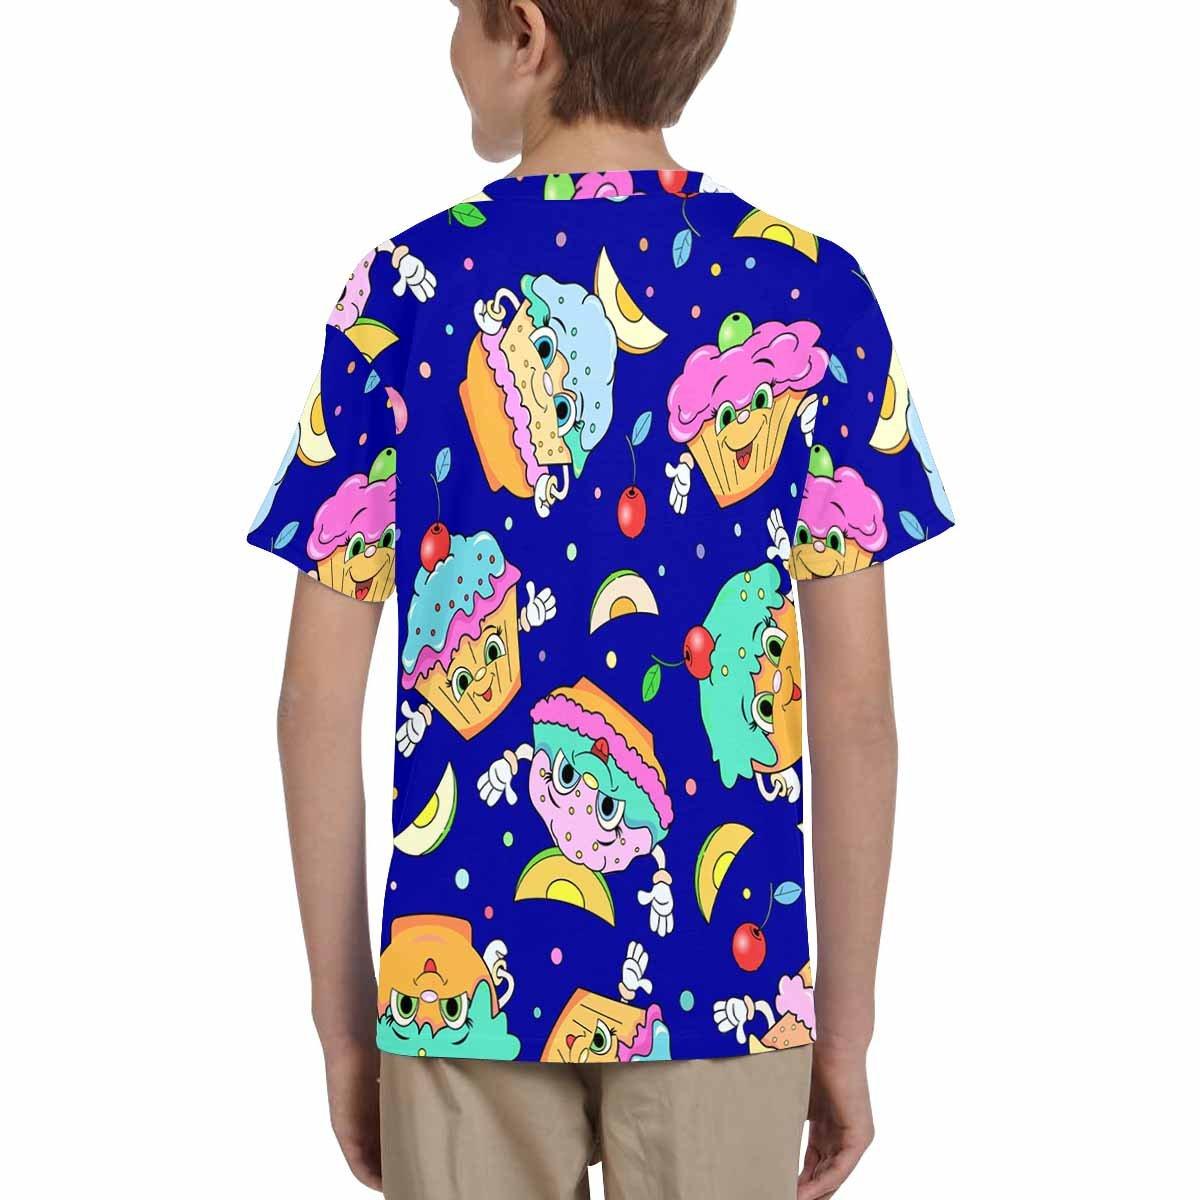 XS-XL INTERESTPRINT Cartoon Funny Cakes Kids T-Shirt